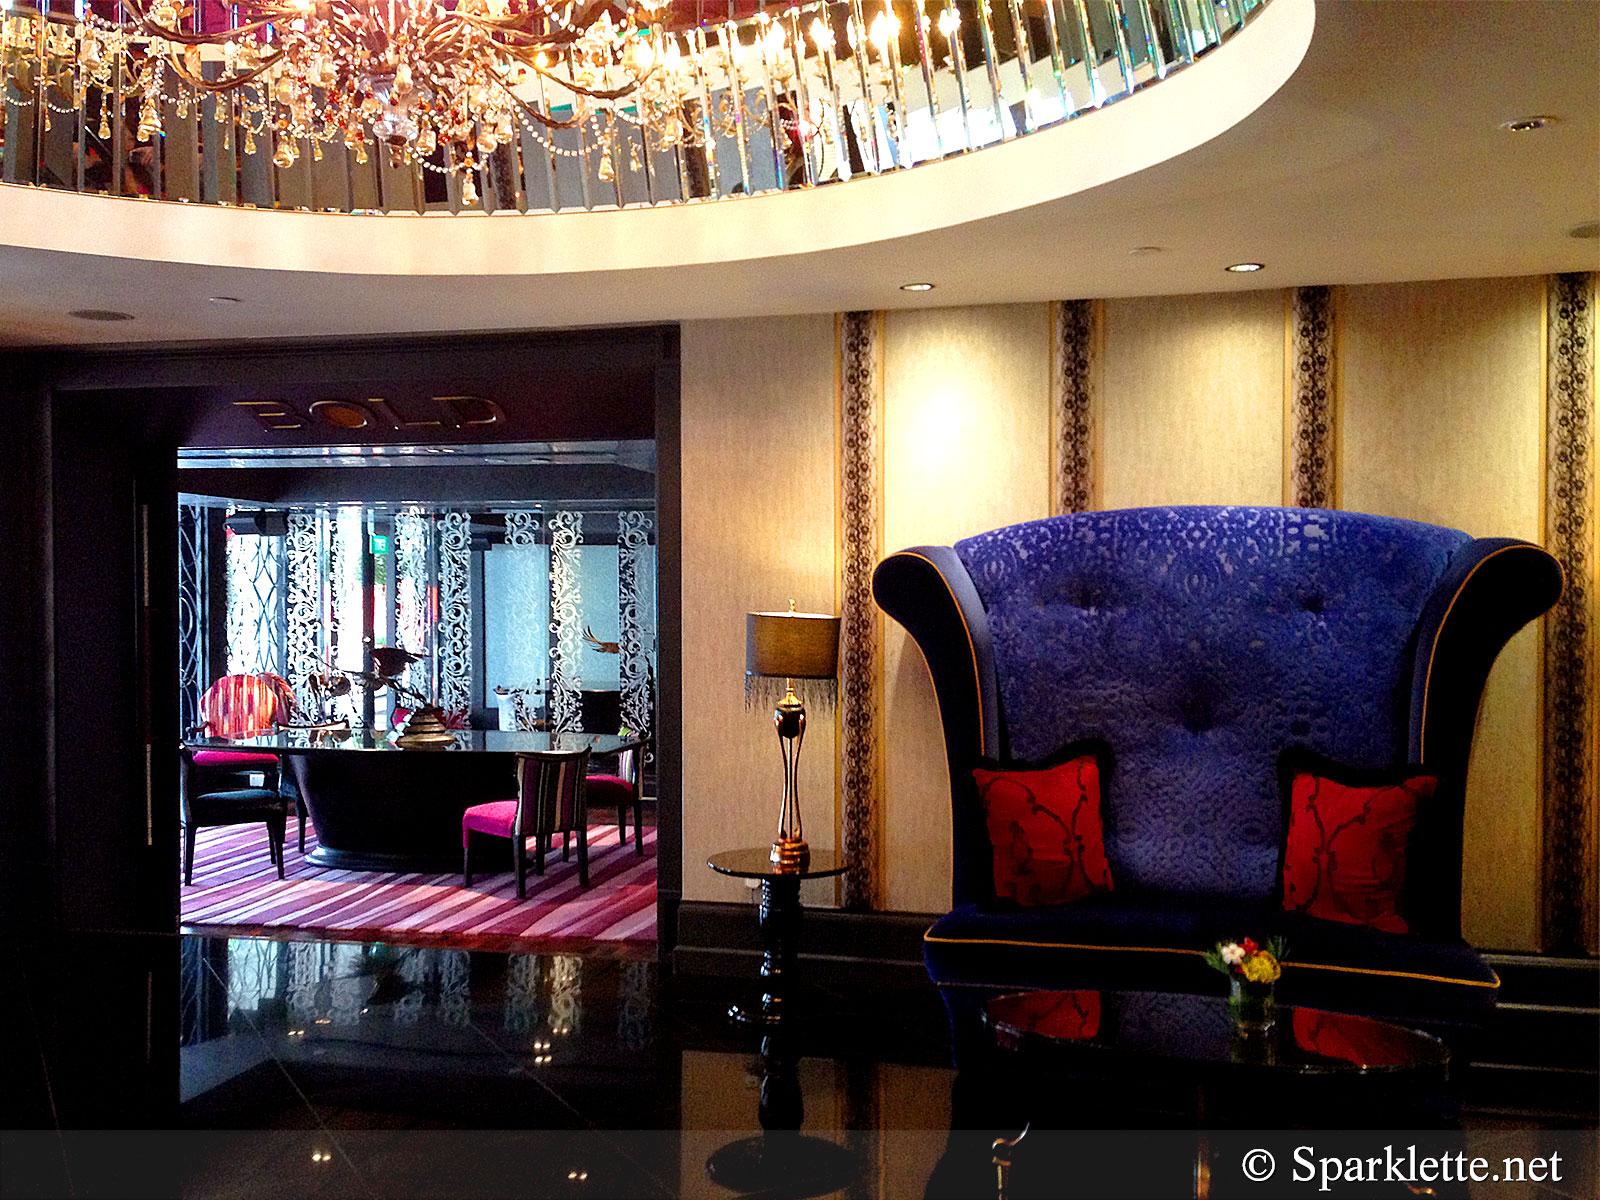 The Scarlet Hotel Lobby 3